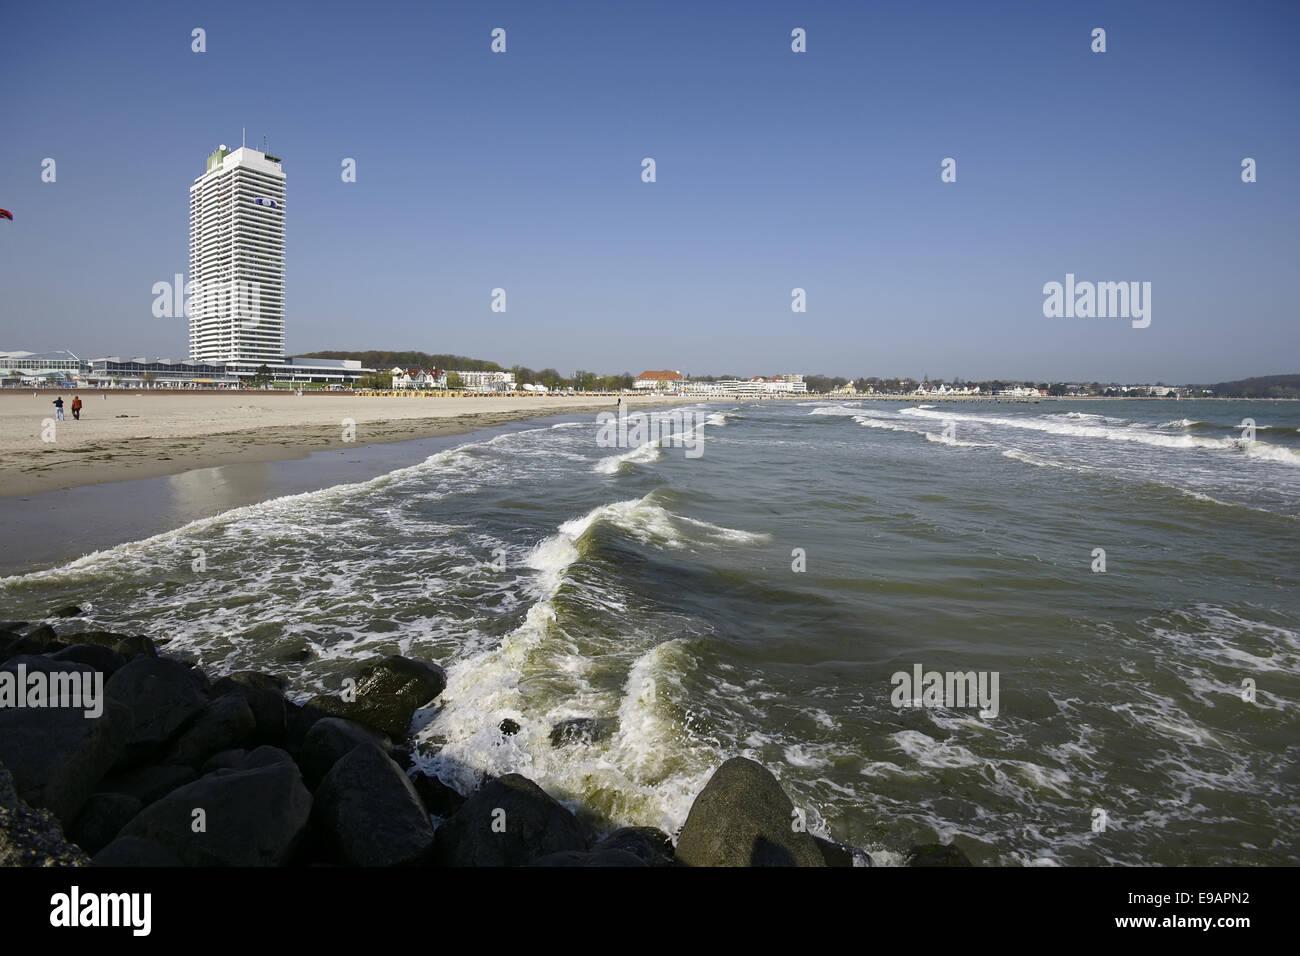 Beach of Travemuende, Germany Stock Photo